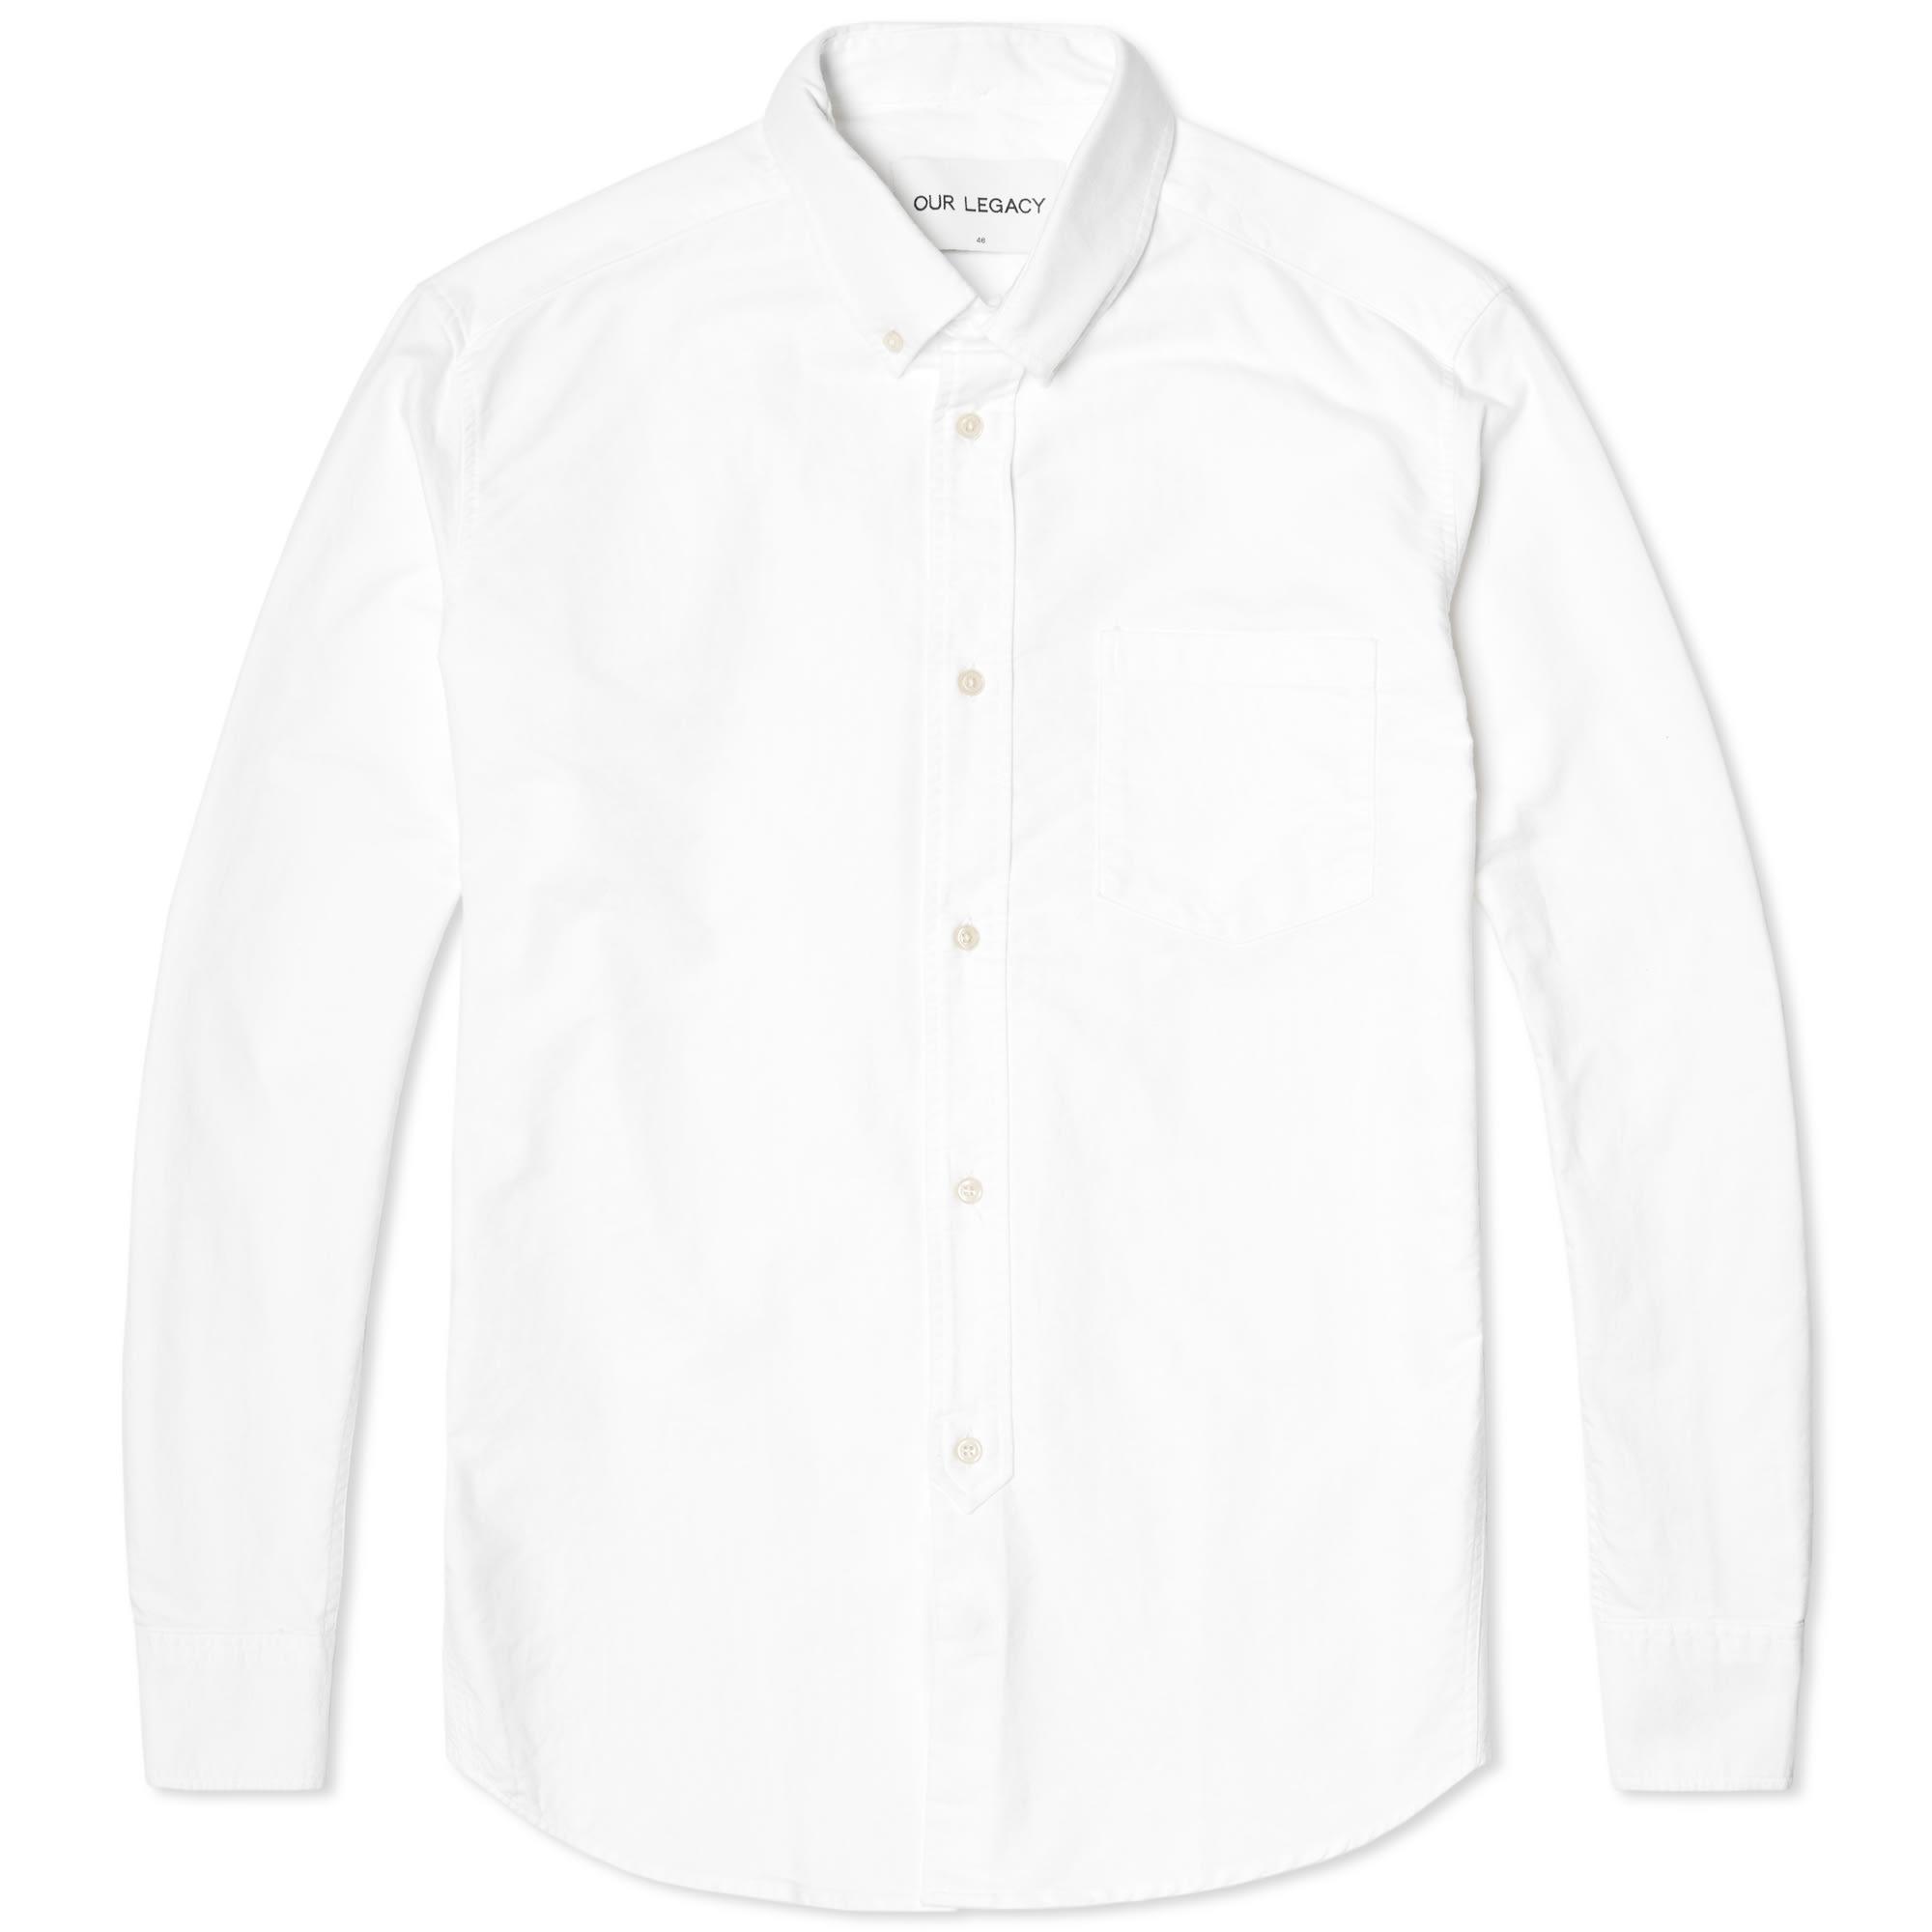 Our legacy everyman 1940s button down shirt heavy white for Heavy button down shirts